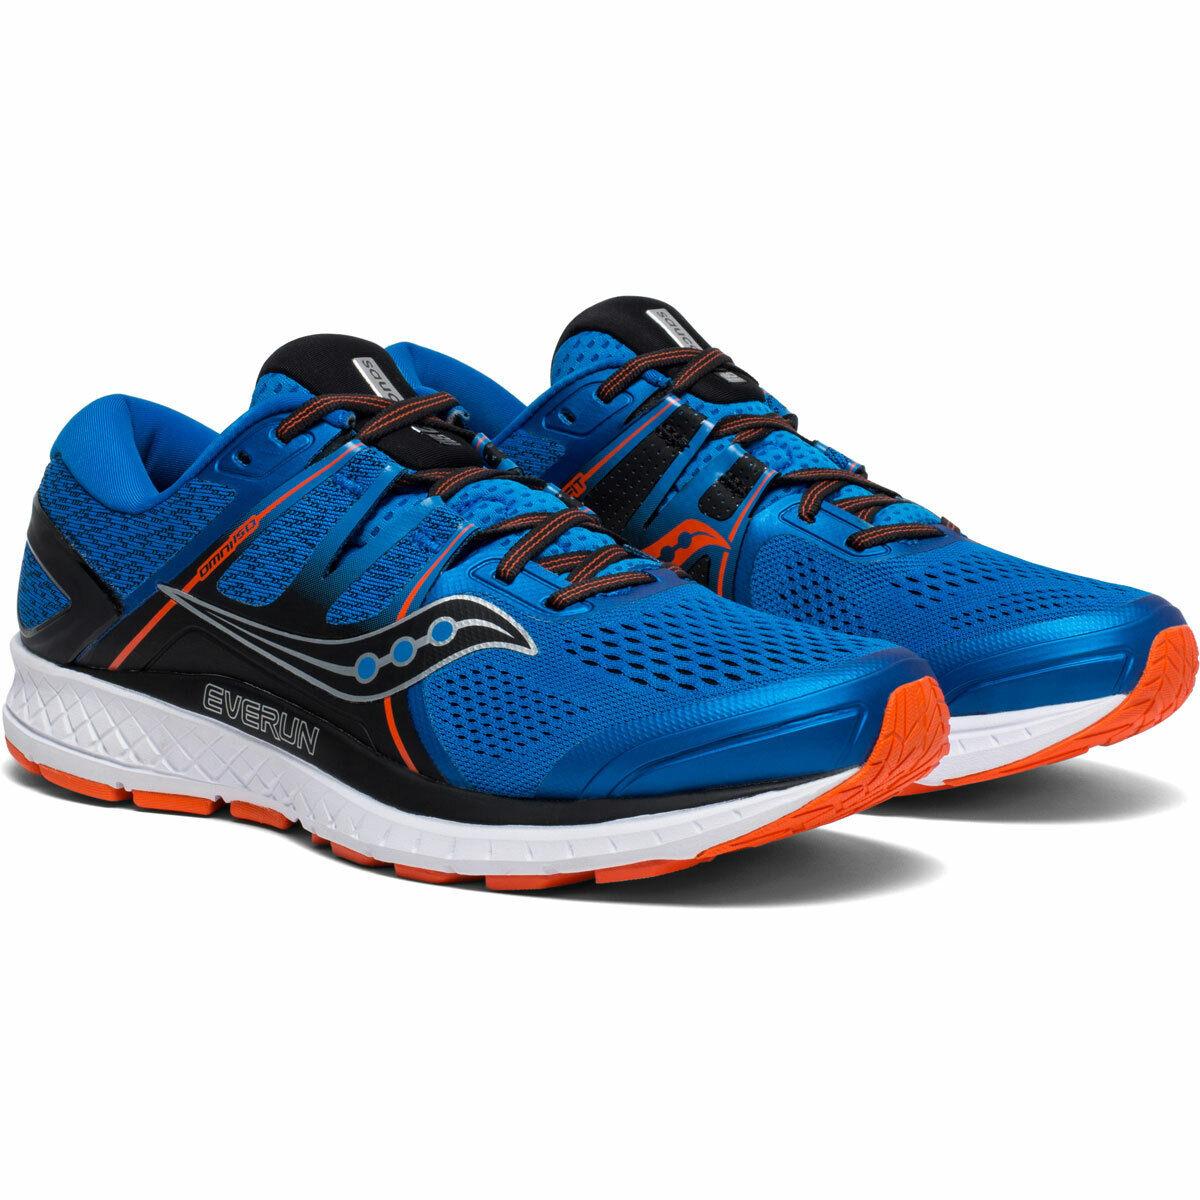 Saucony Omni ISO Men zapatillas azul naranja   ss20442-36 con everun topsole